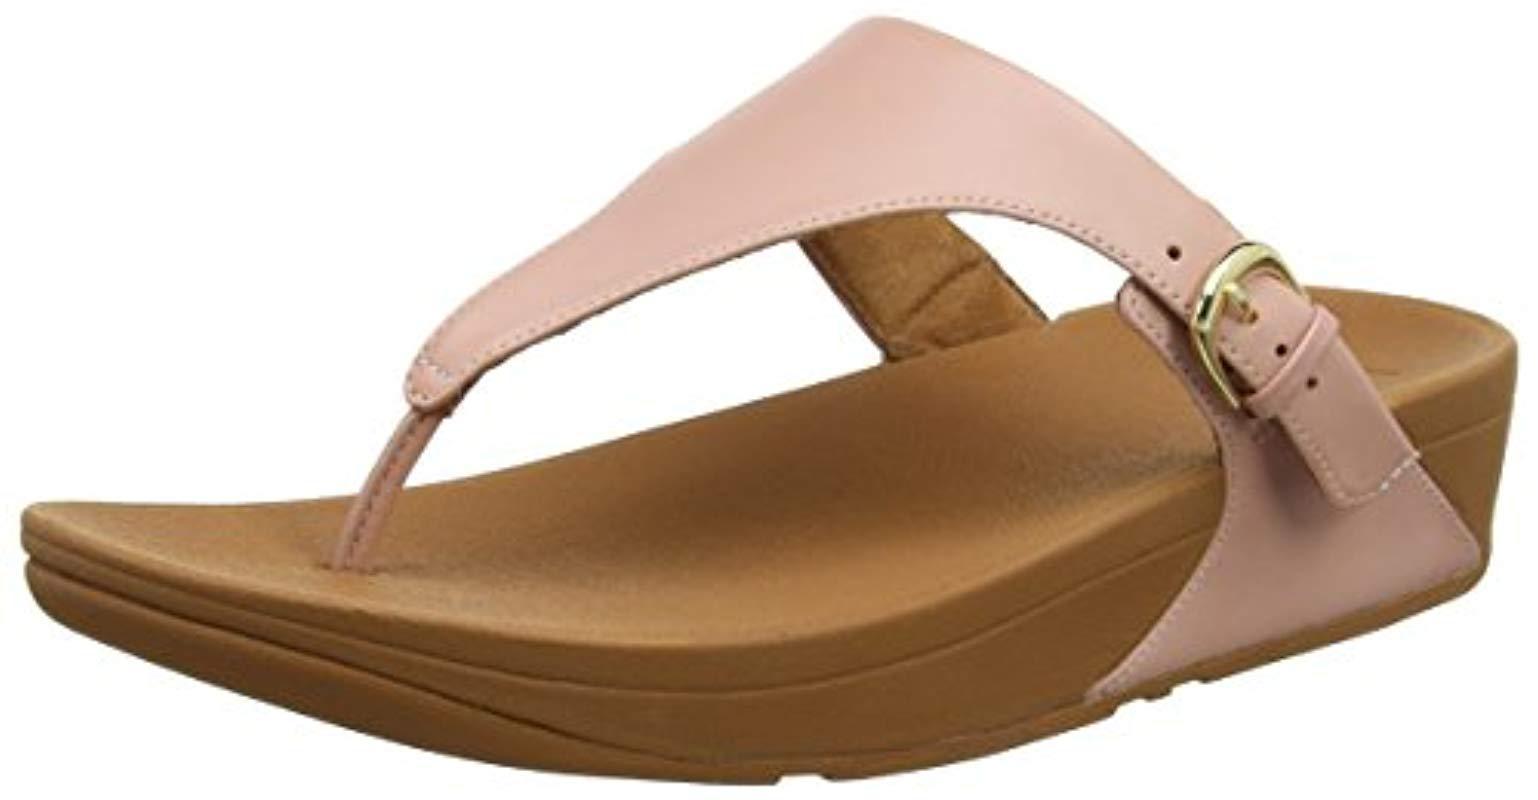 52a385feb234de Fitflop. Women s Skinny Toe Thong Leather Heels Sandals